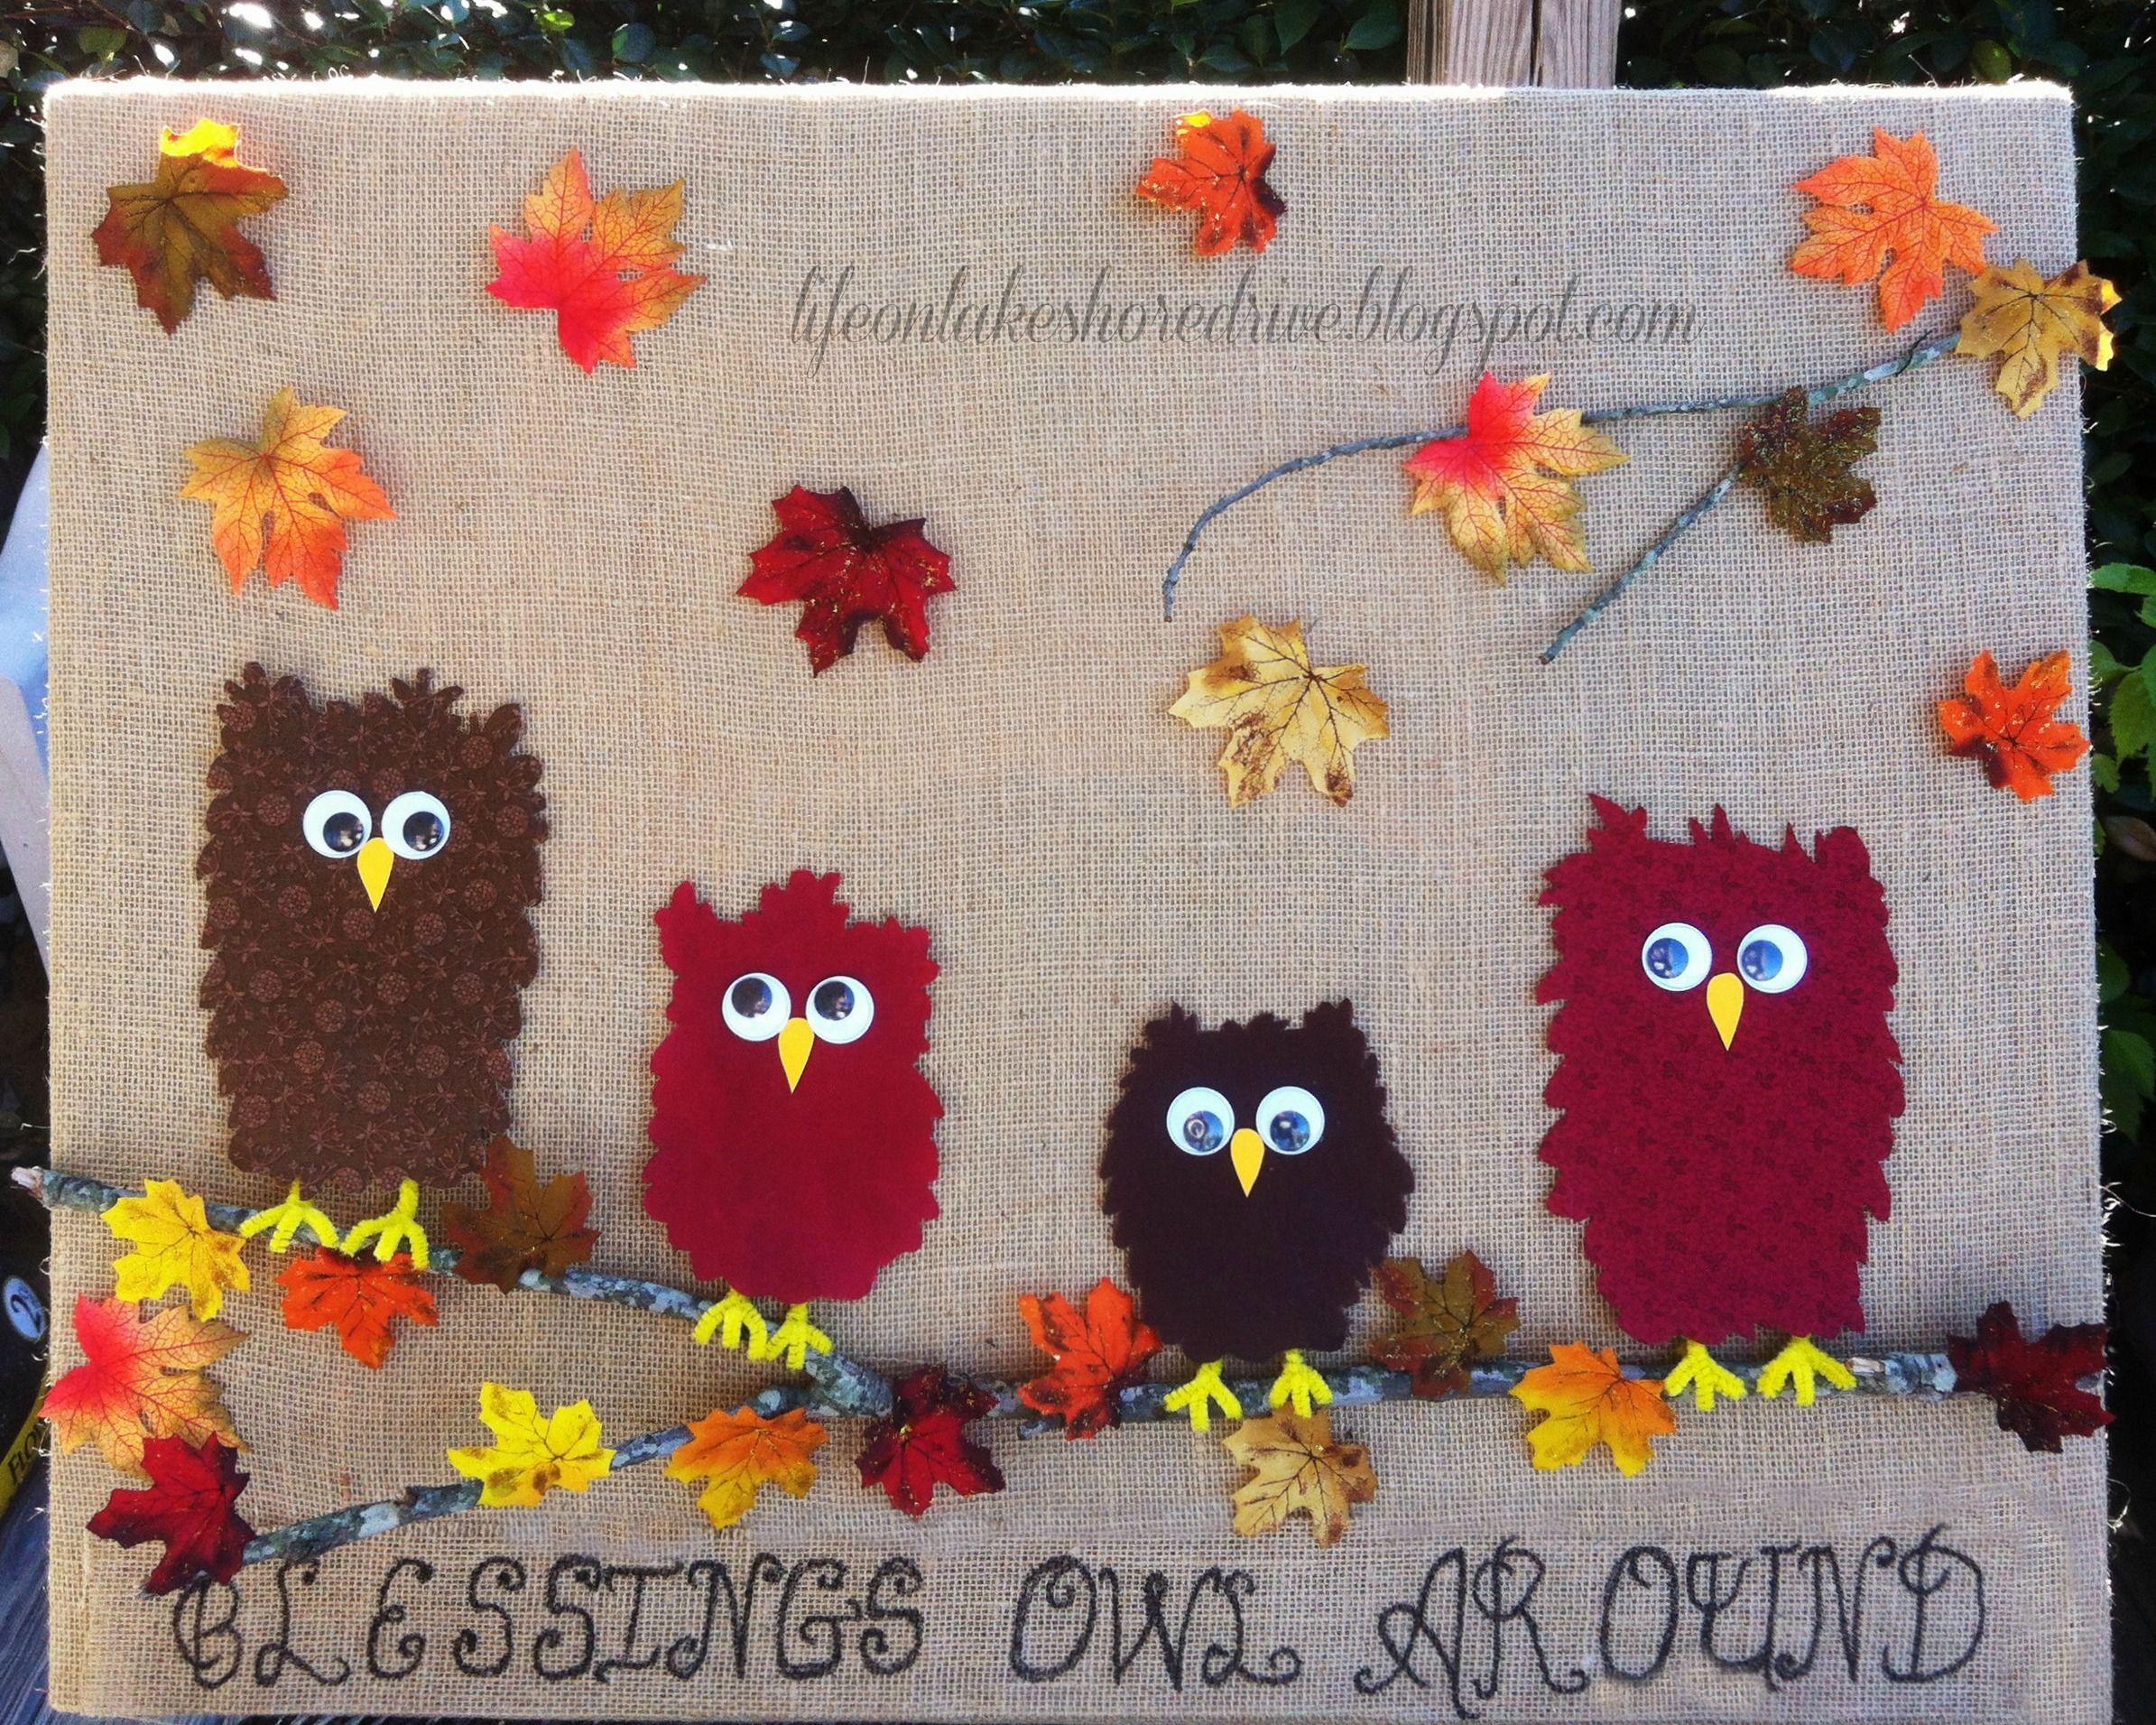 Diy thanksgiving wall decor - Diy Thanksgiving Wall Decor Diy Thanksgiving Wall Decor 39